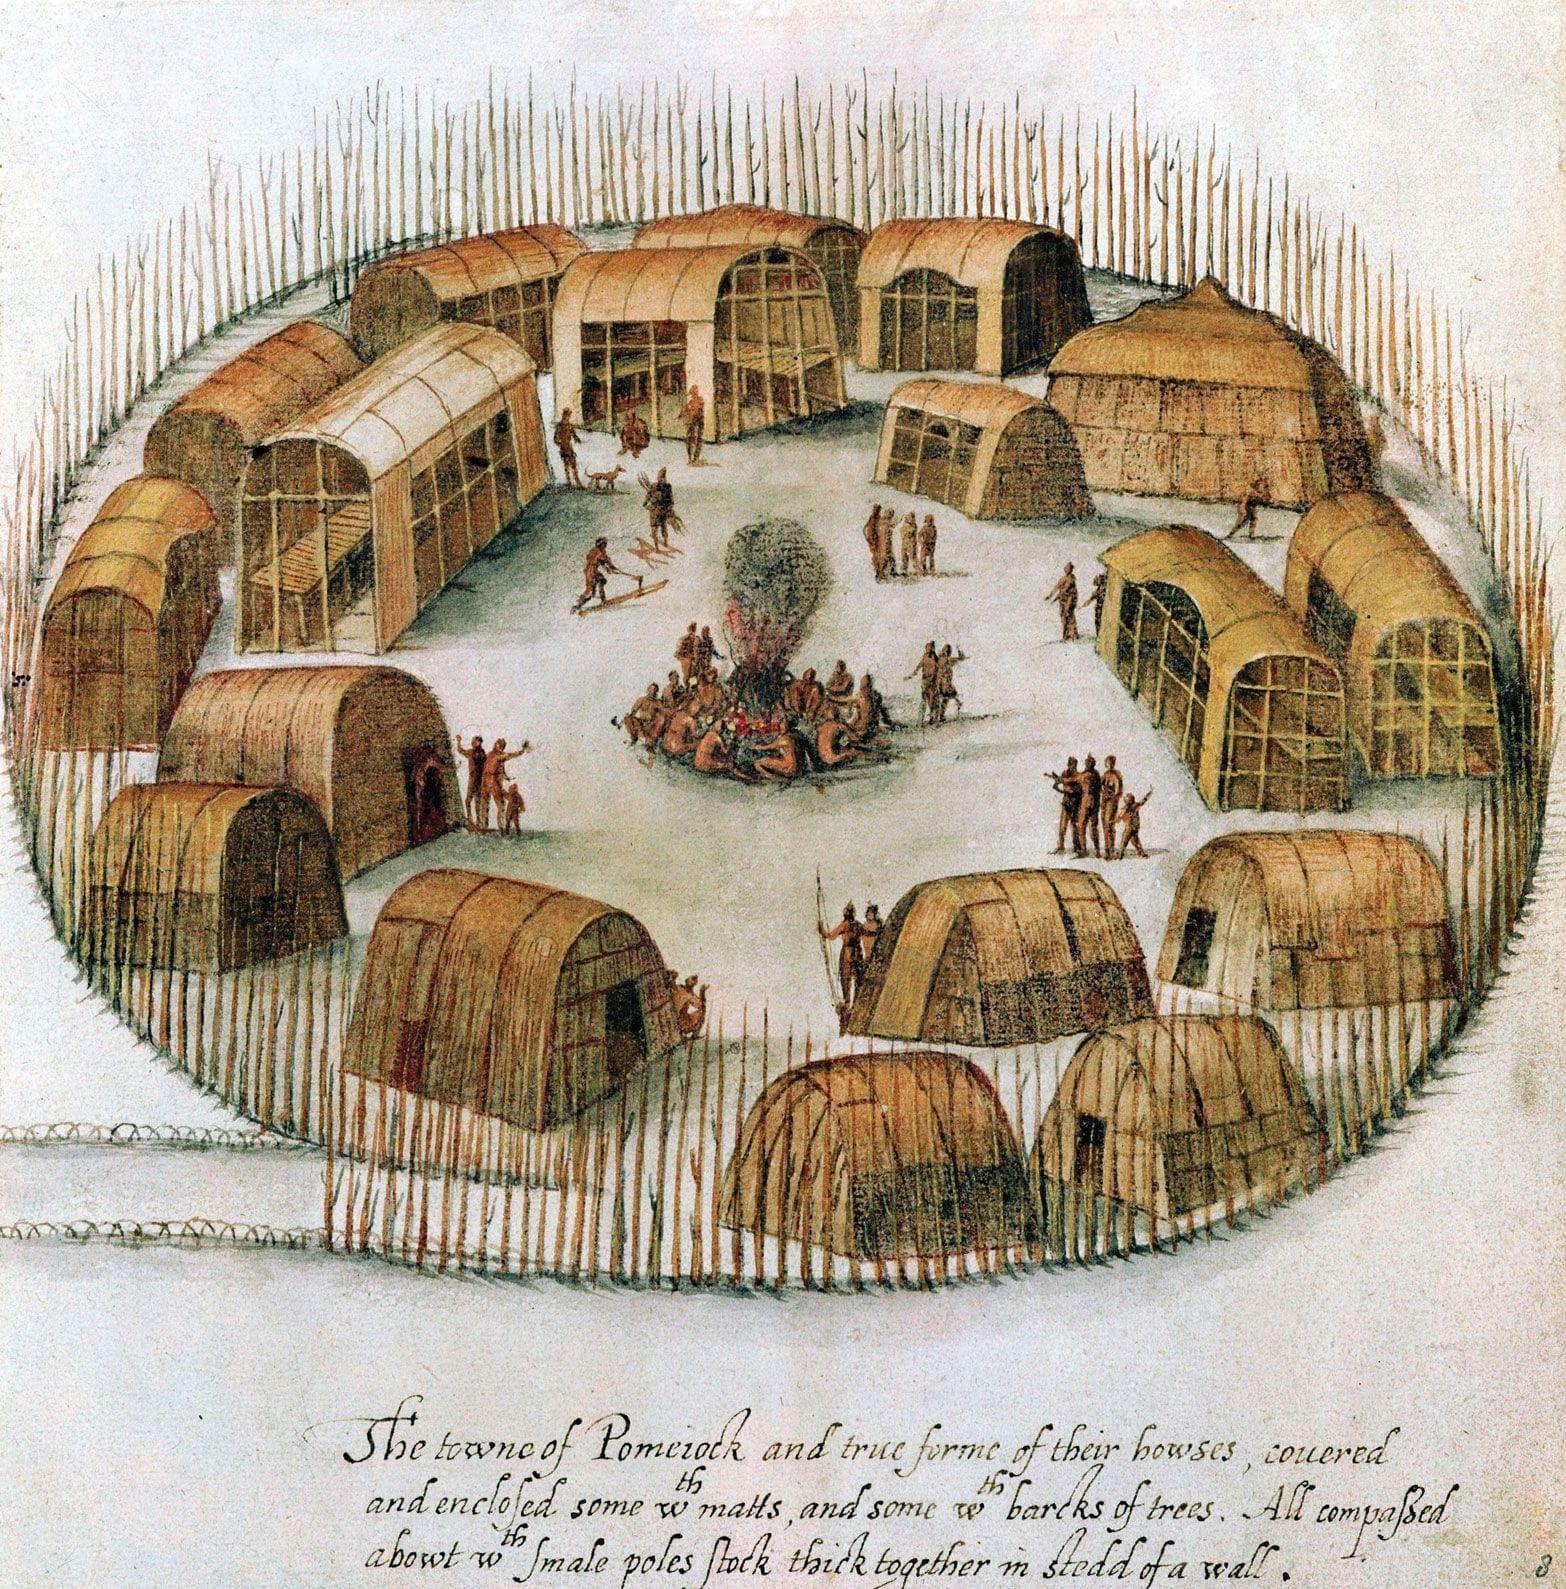 Random Utterly Fascinating Theories Behind Vanishing Roanoke Colony